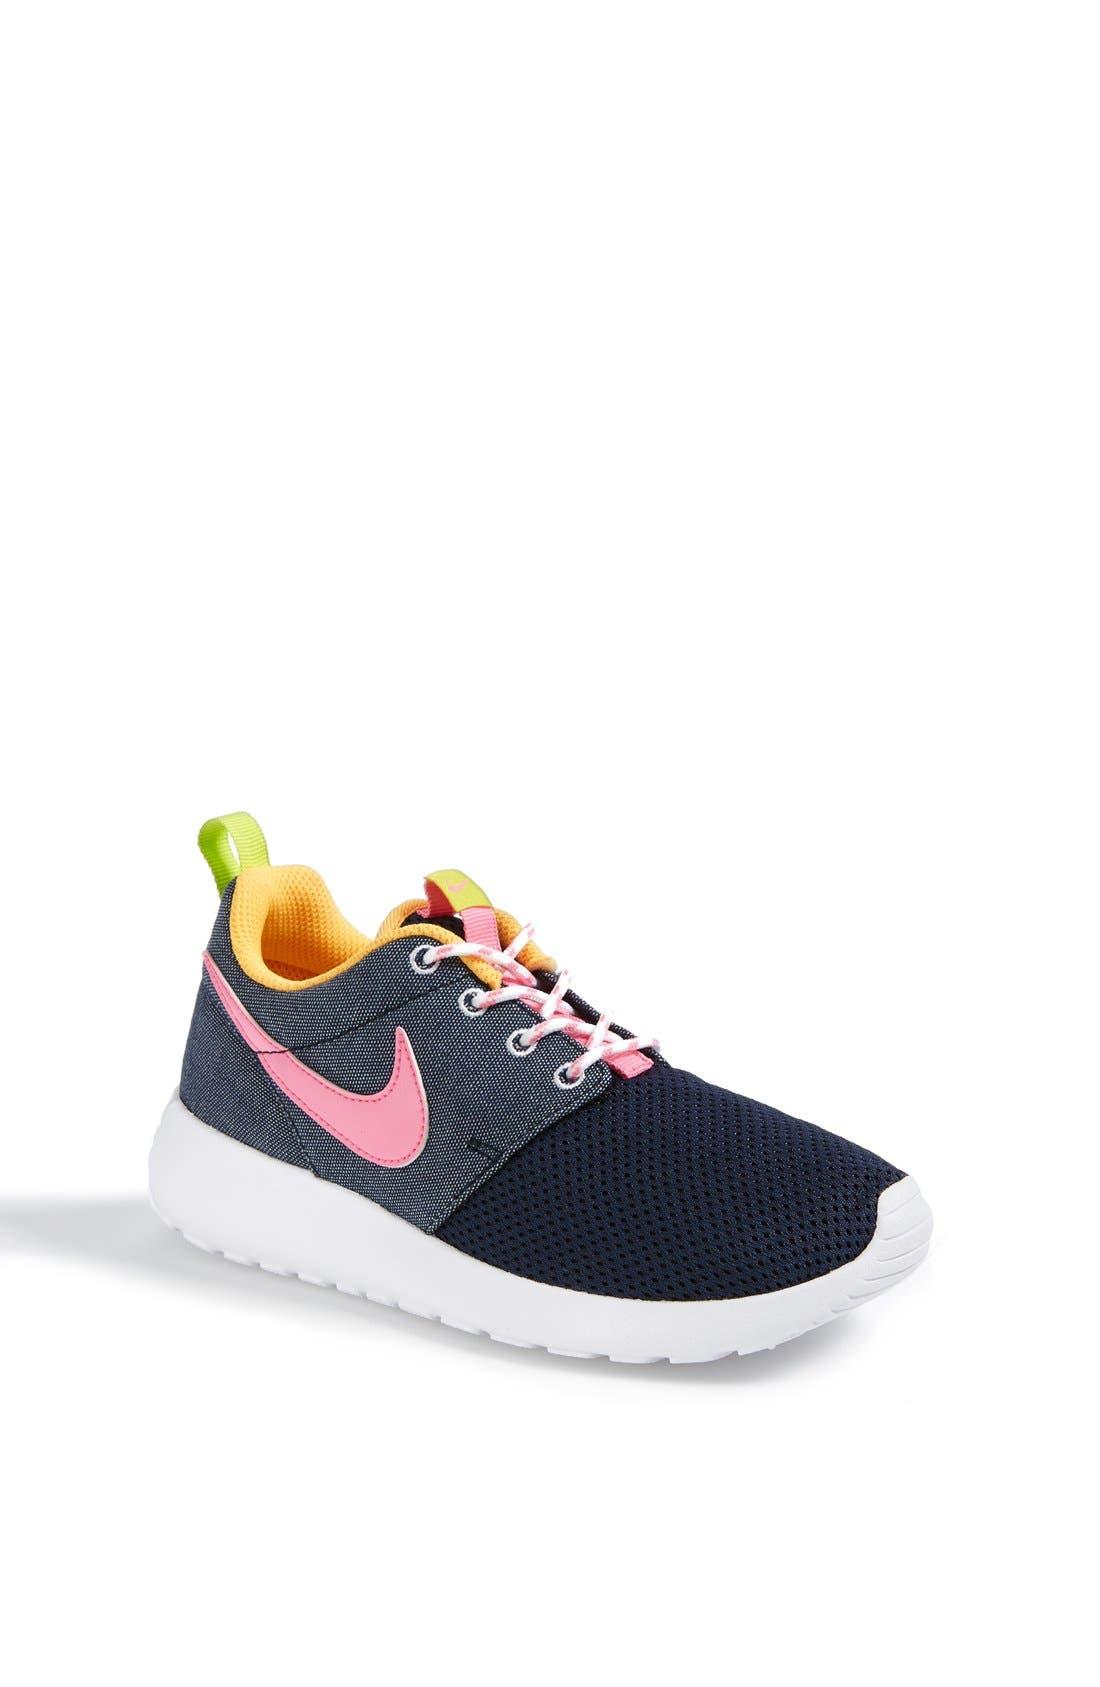 'Roshe Run' Athletic Shoe,                             Main thumbnail 30, color,